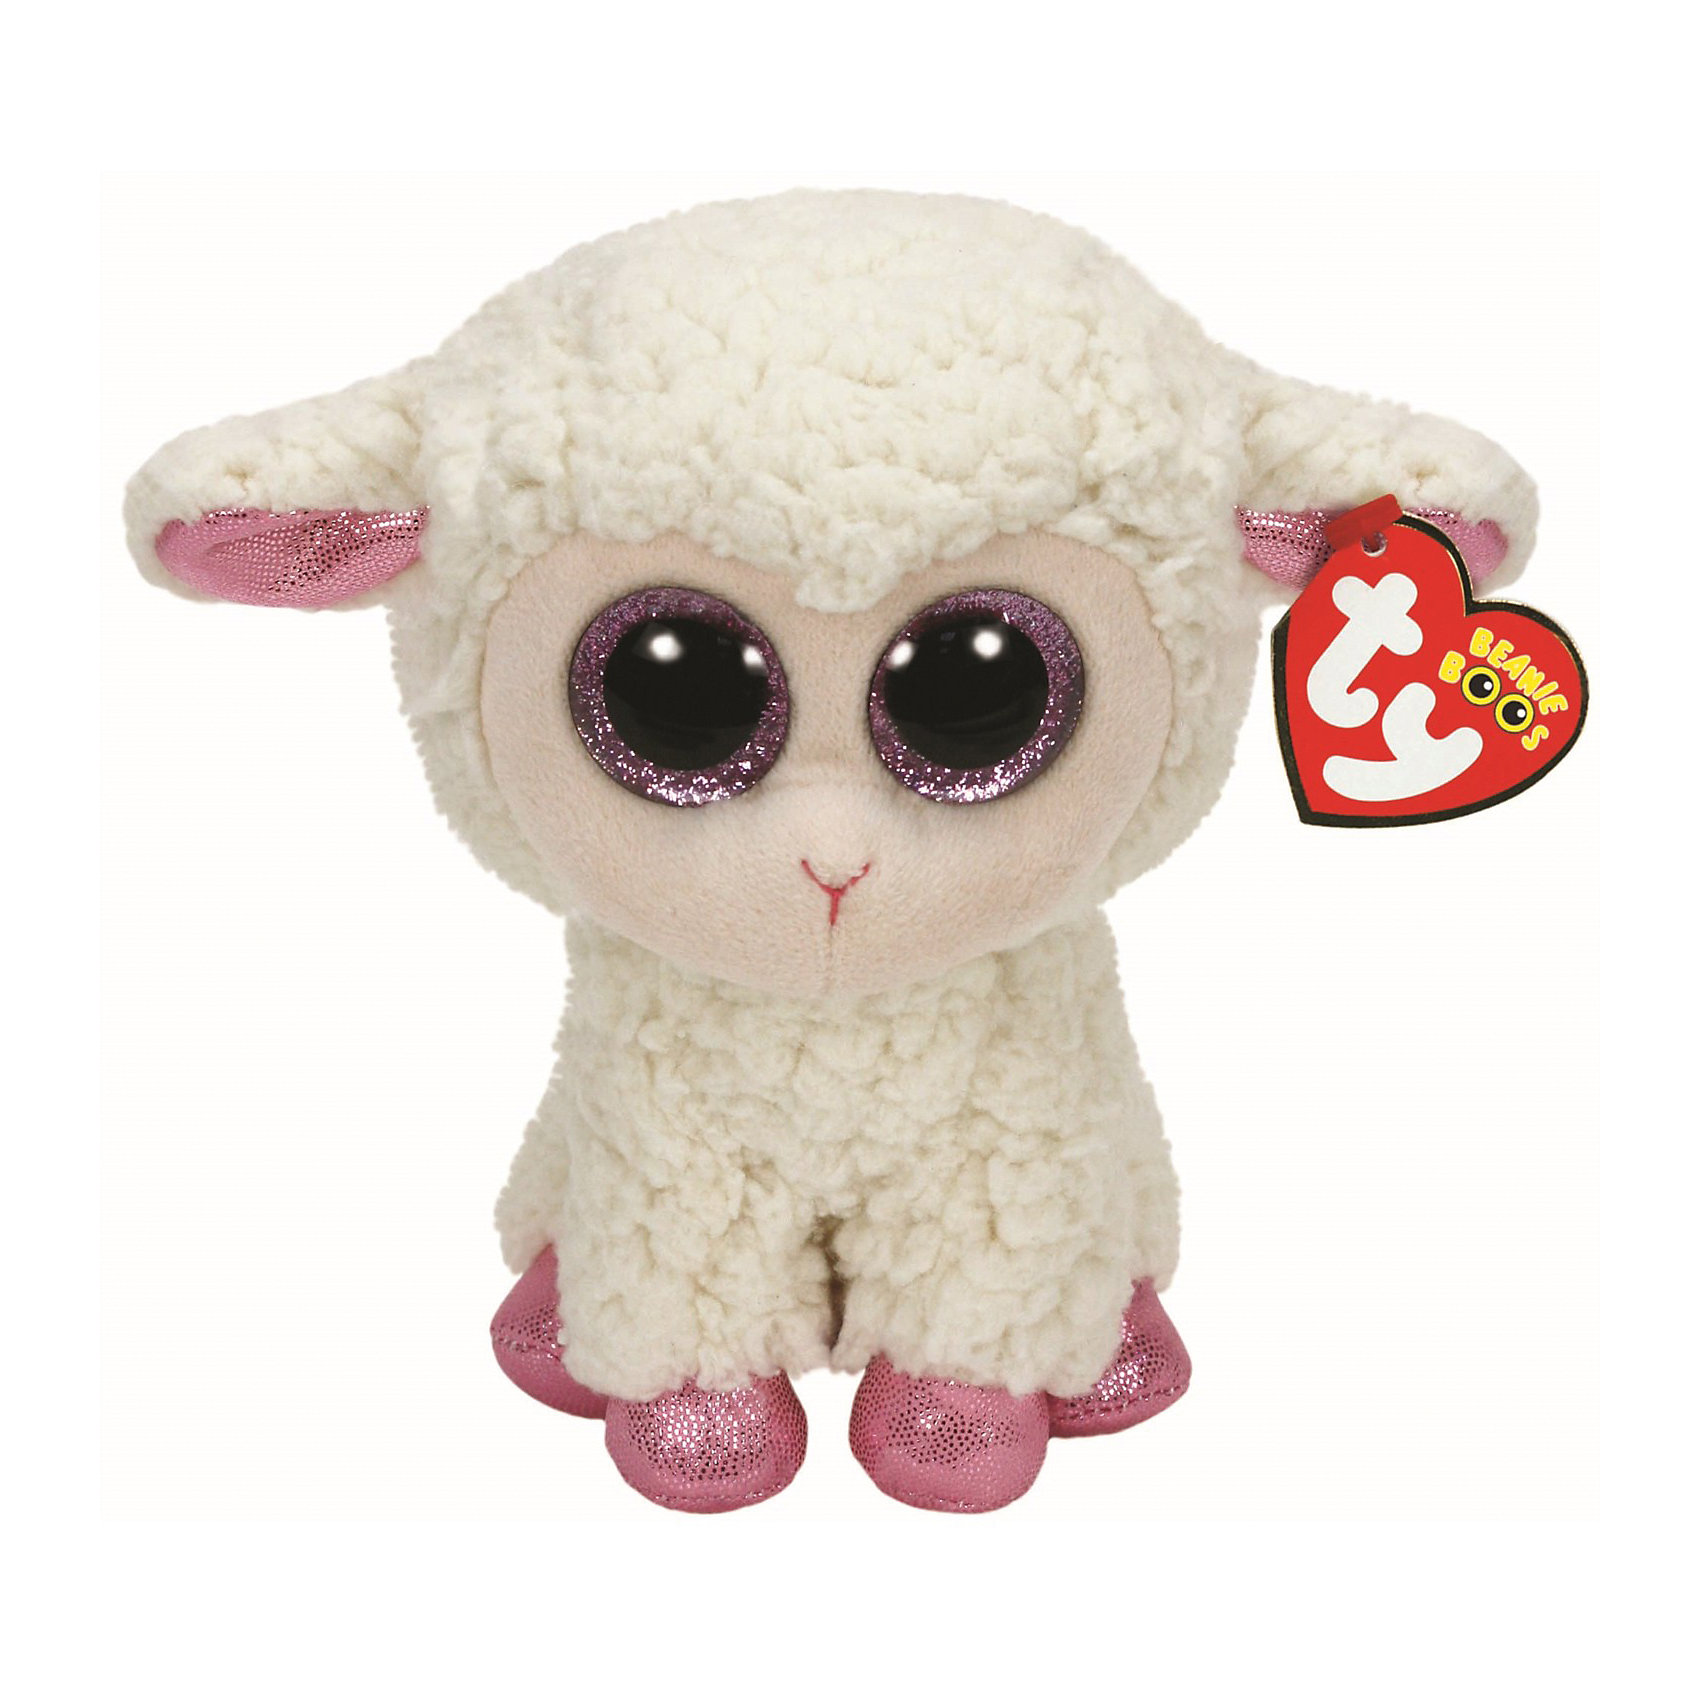 Ty Овечка белая с розовыми копытцами, 15 см, Ty ty frizzy домовёнок tang 15 см 37138